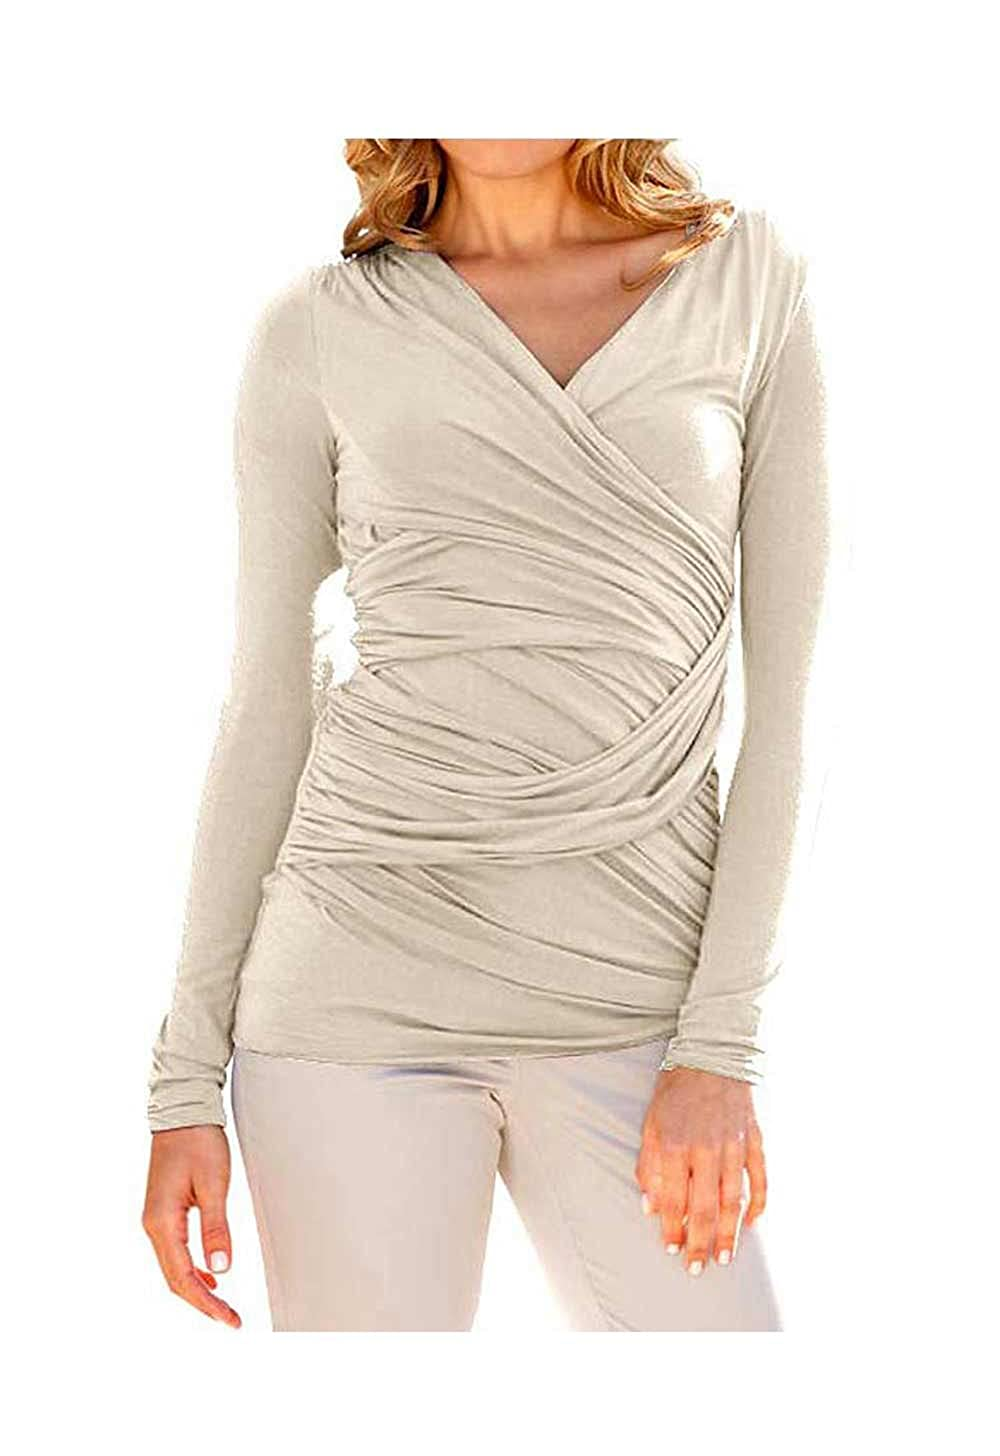 Heine Damen-Shirt Wickelshirt Braun Größe 36  Amazon.de  Bekleidung 52a9504003